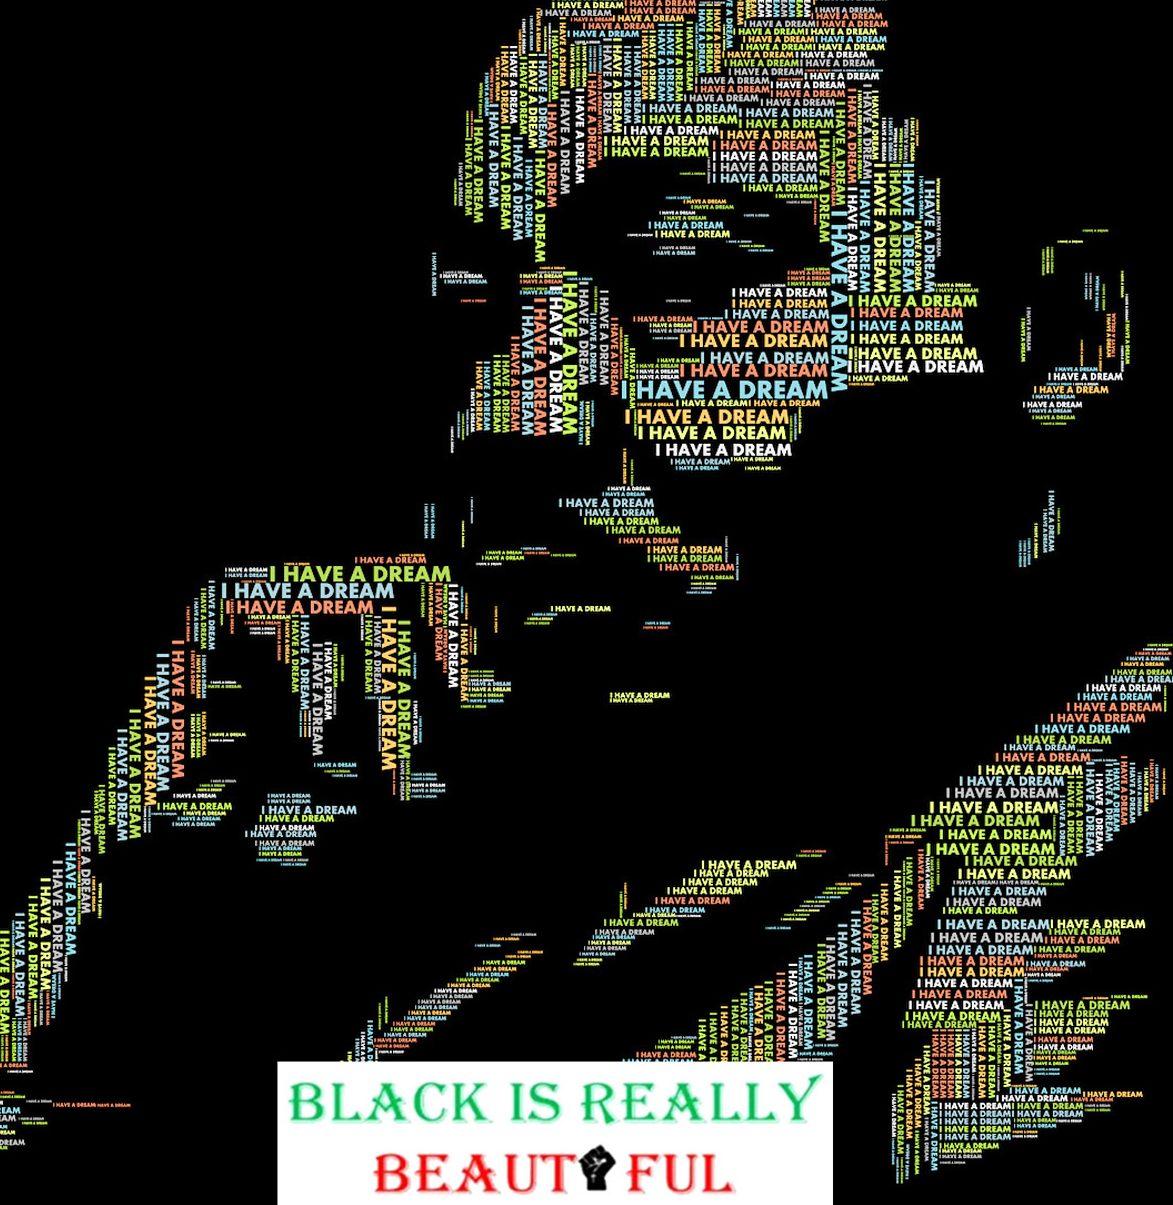 Martin Luther King Blackisreallybeautiful